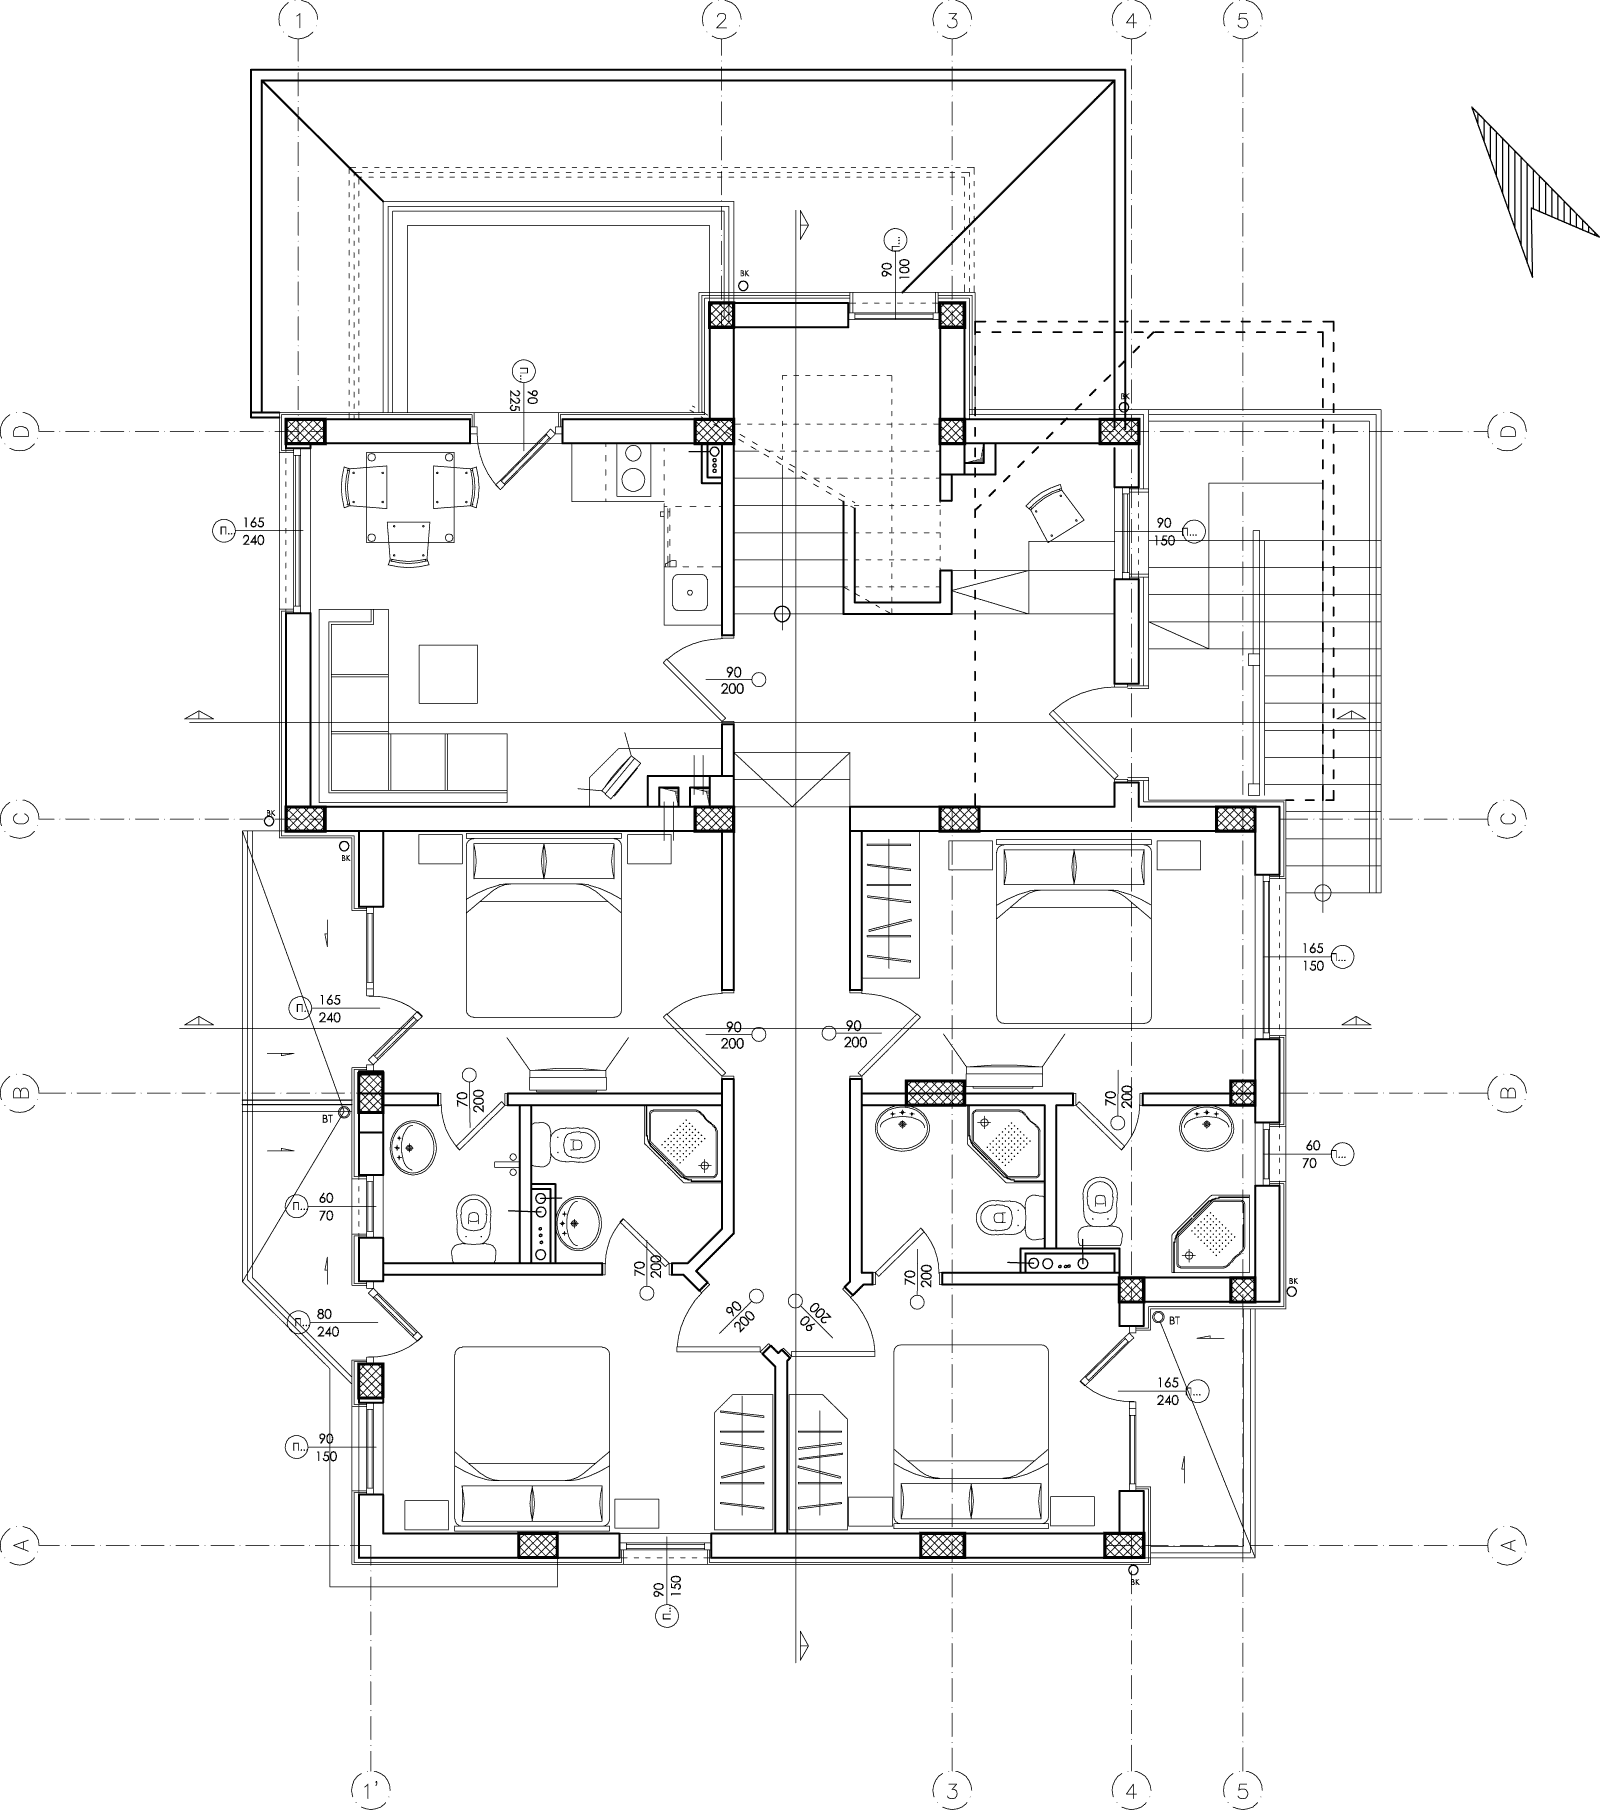 Plan De Maison Moderne plan de maison moderne gratuit : infos & téléchargement